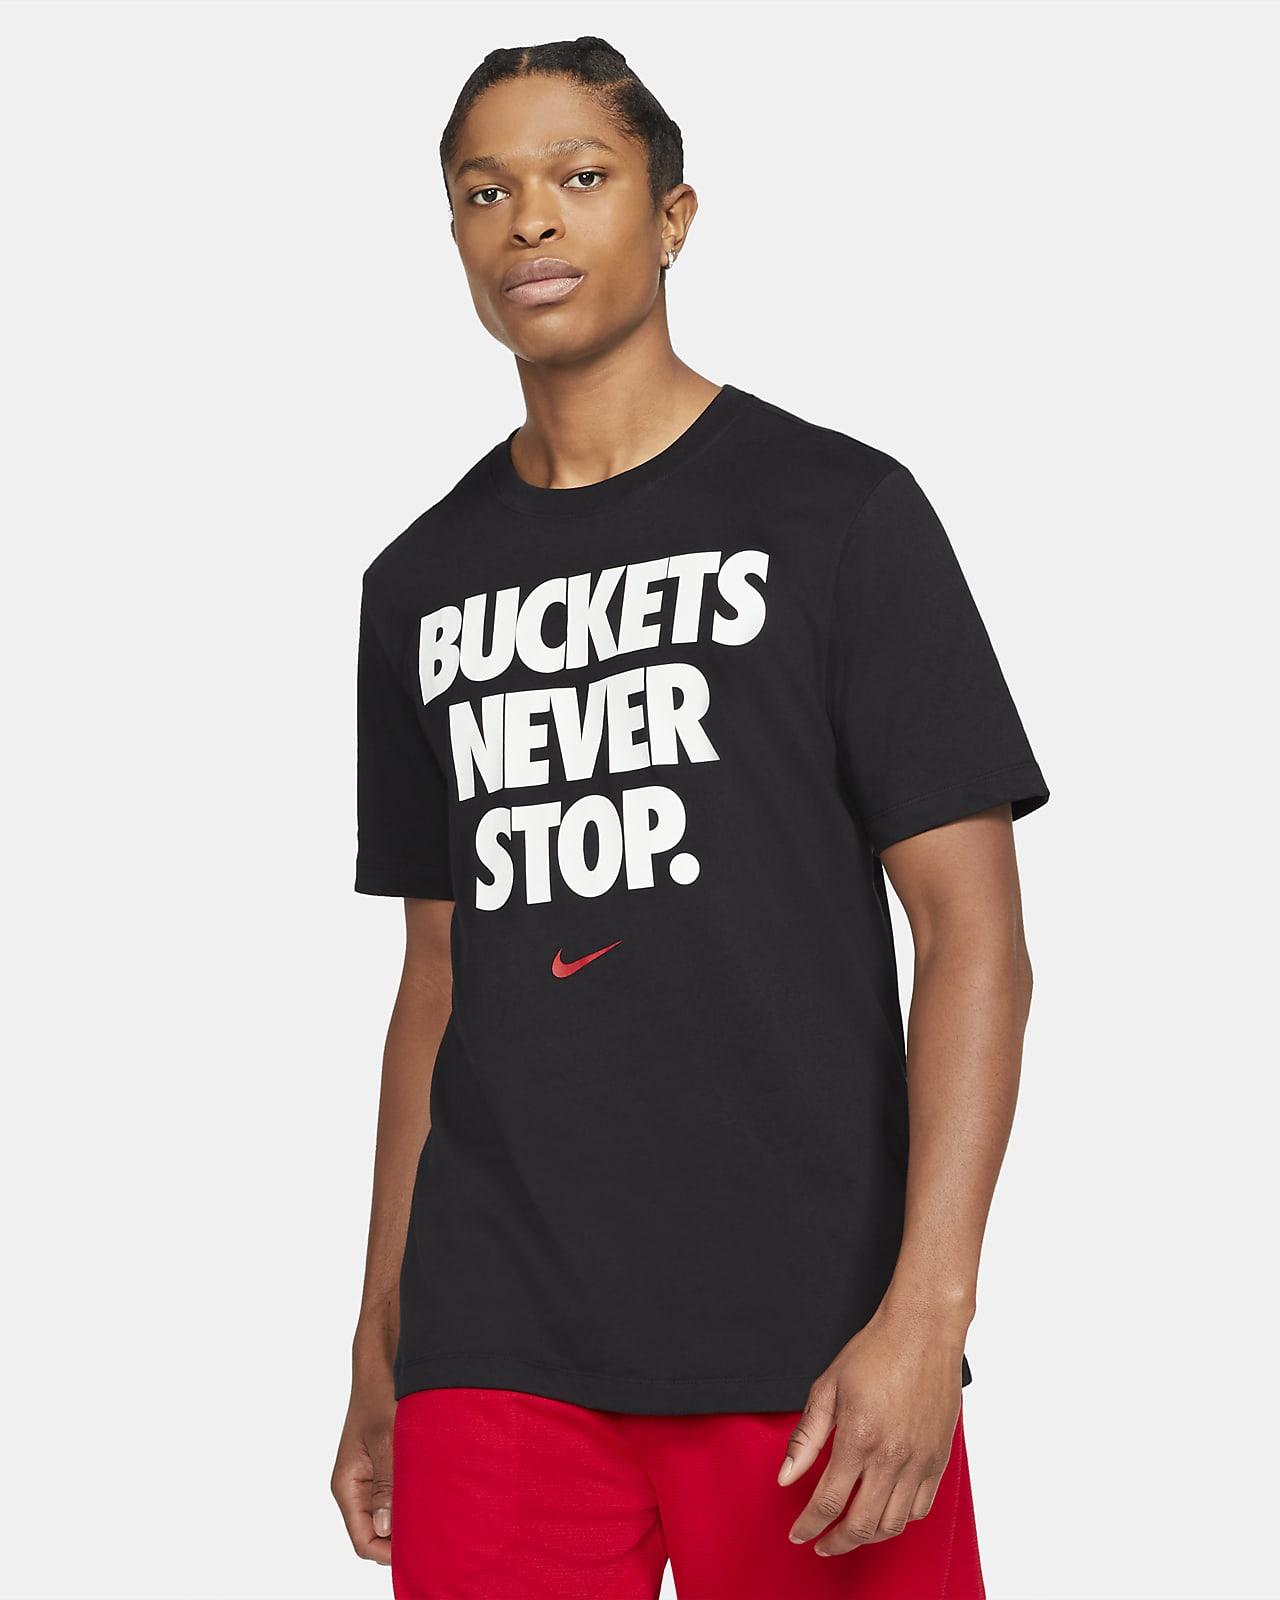 Nike Dri-FIT 'Buckets' Men's Basketball T-Shirt